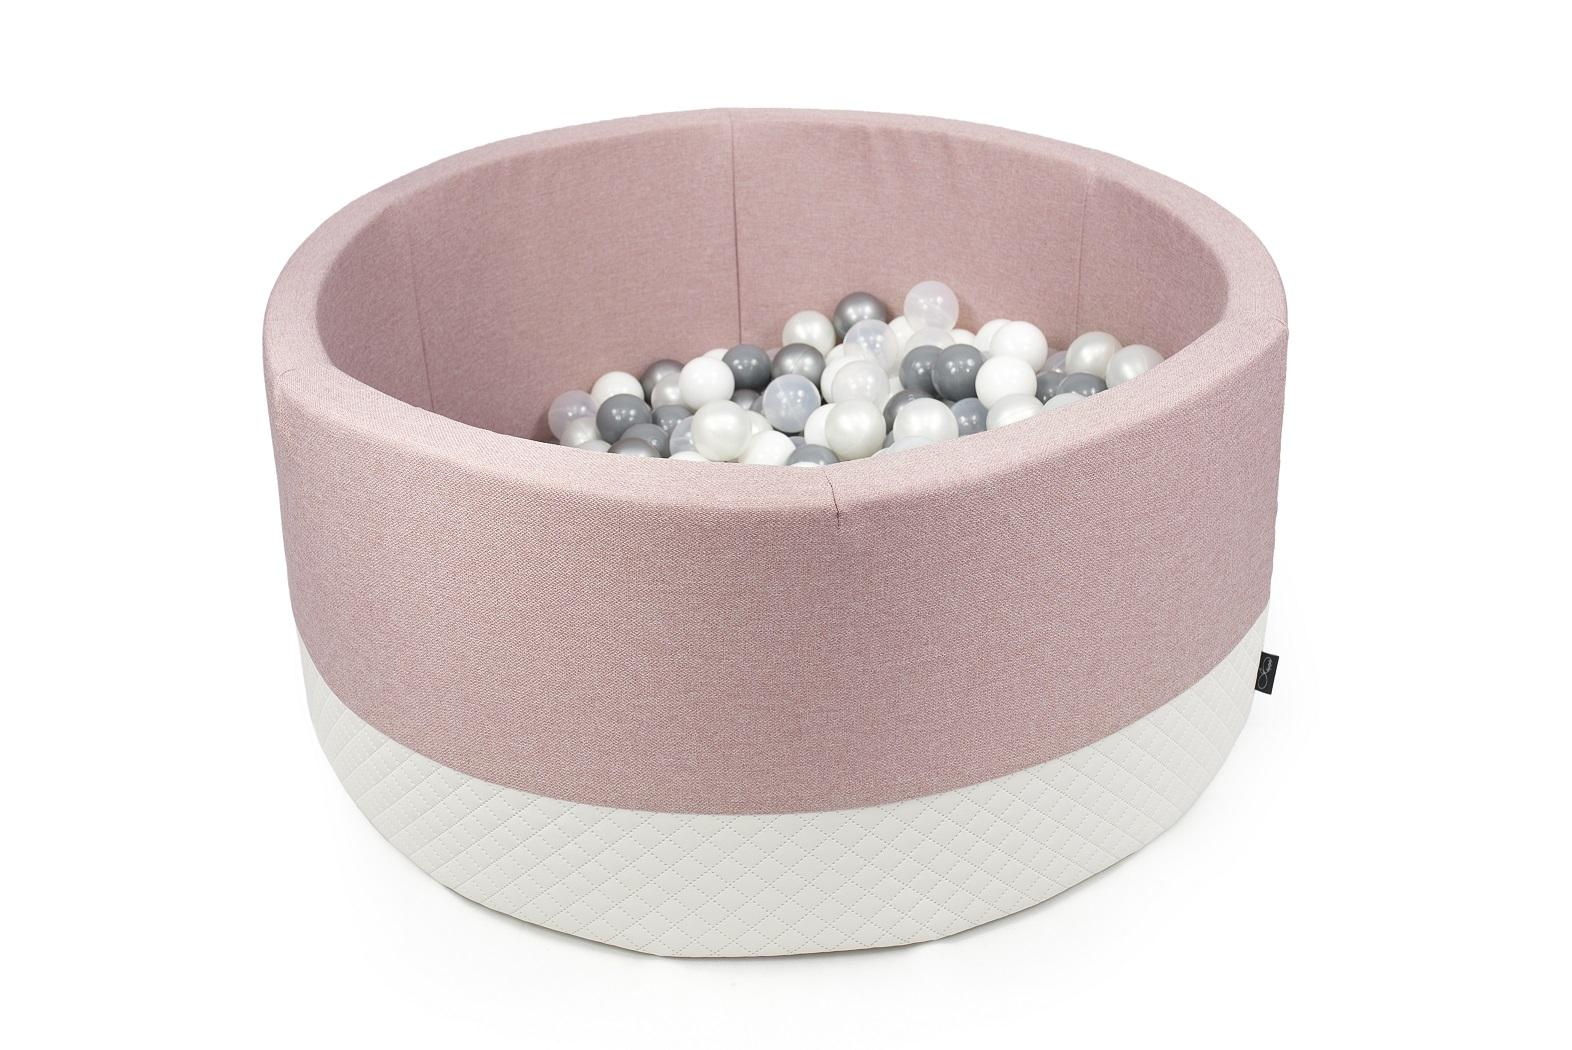 Boldbassin m. imiteret quiltet øko-læder - Støvet rosa - Rundt 90x40 cm inkl 200 bolde ...